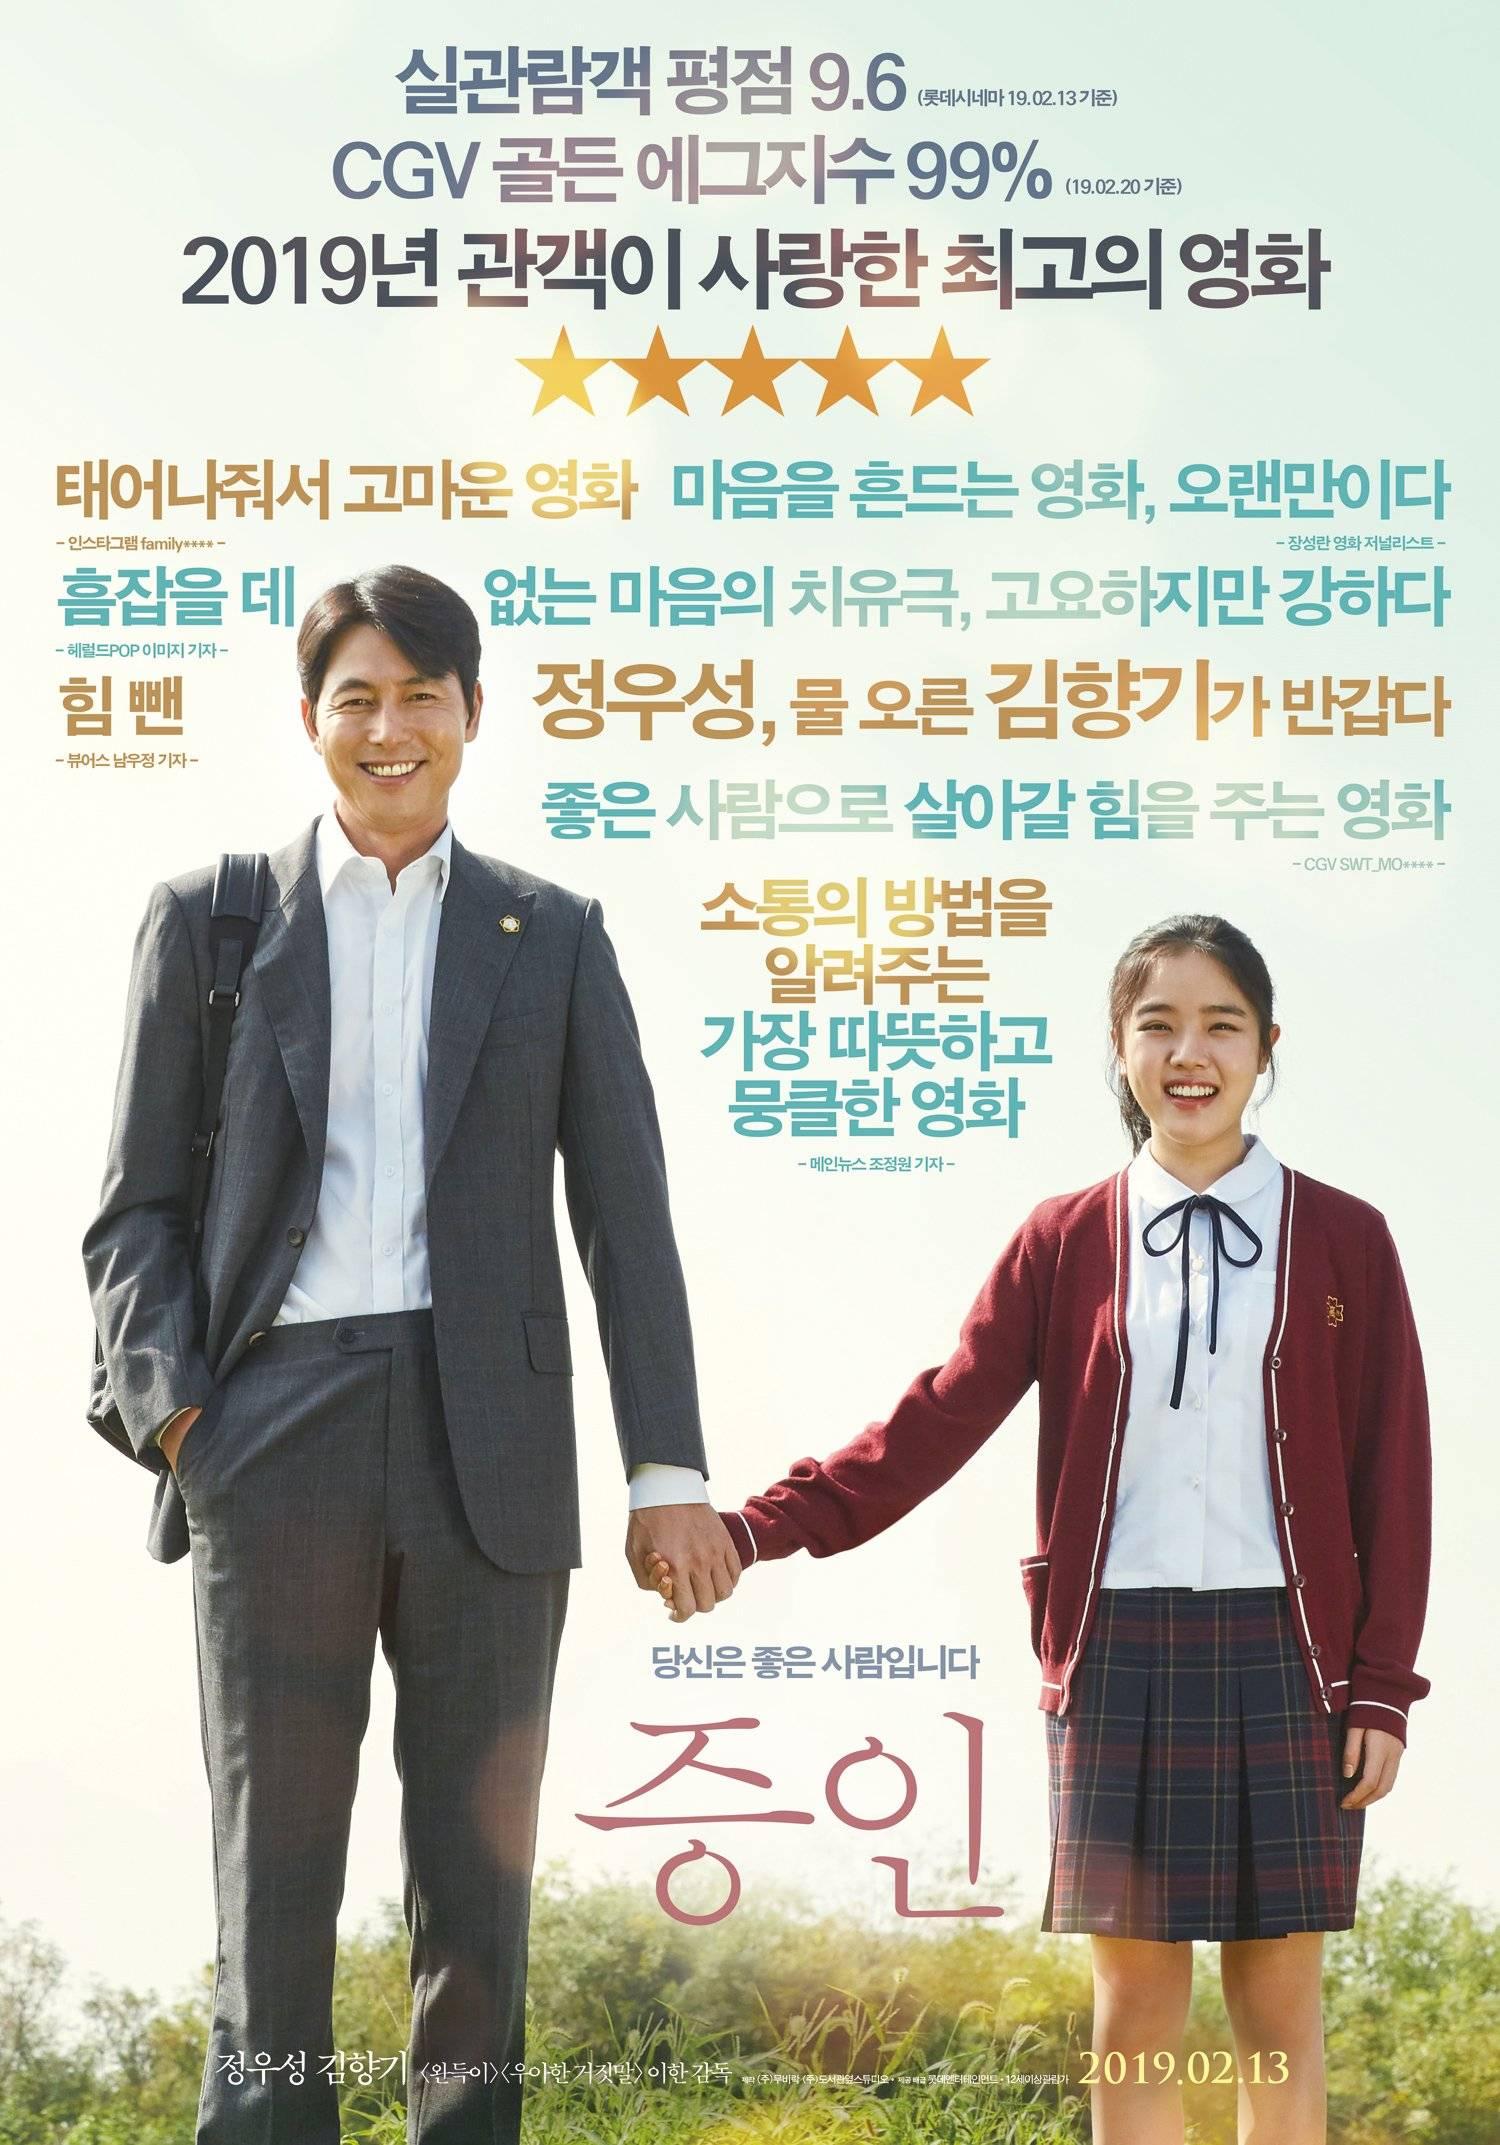 Photos] Quiet Jung Woo-sung and Kim Hyang-gi Stills and Poster